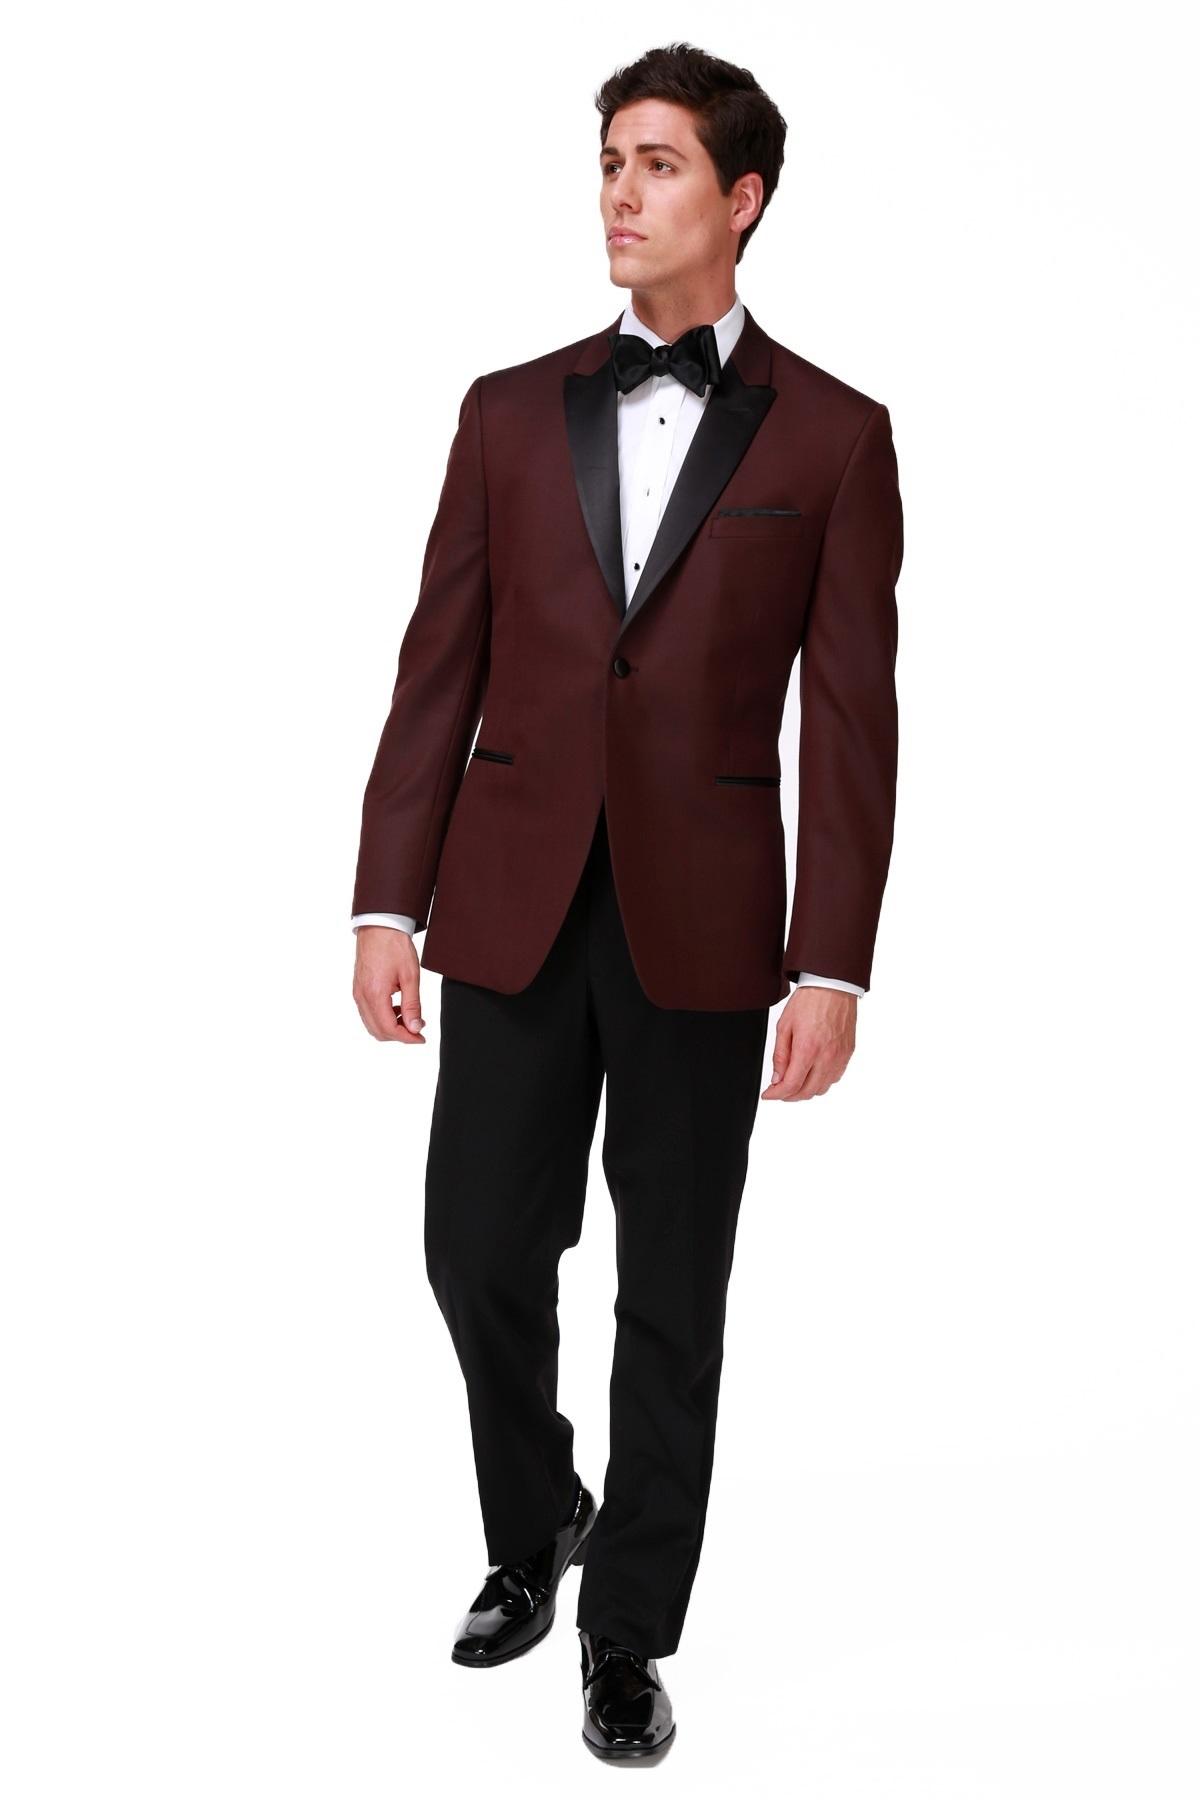 Milroy's Tuxedos - Burgundy Ike Behar Marbella Tuxedo